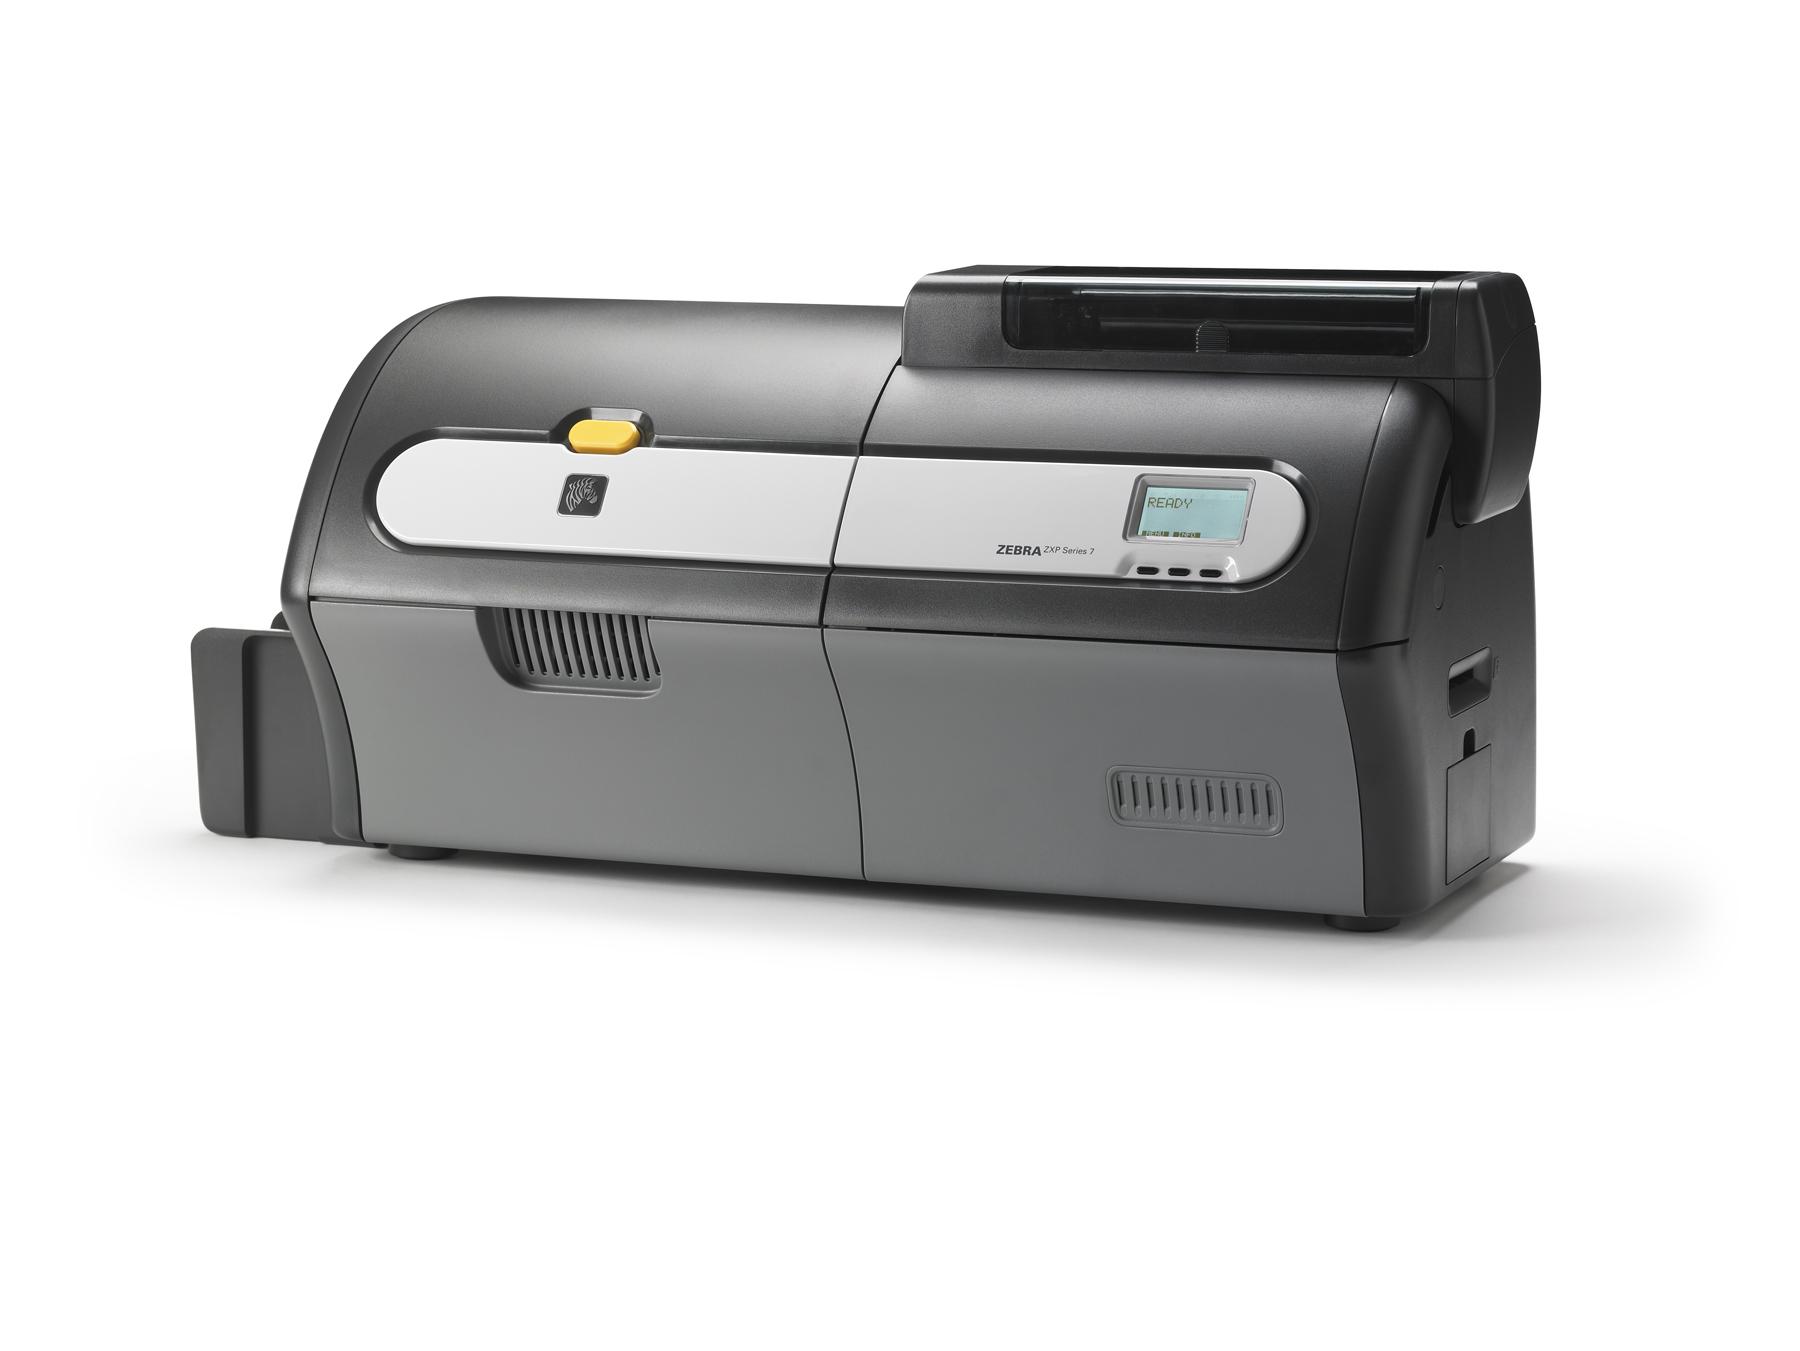 Zebra ZXP 7 impresora de tarjeta plástica Pintar por sublimación/Transferencia térmica Color 300 x 300 DPI